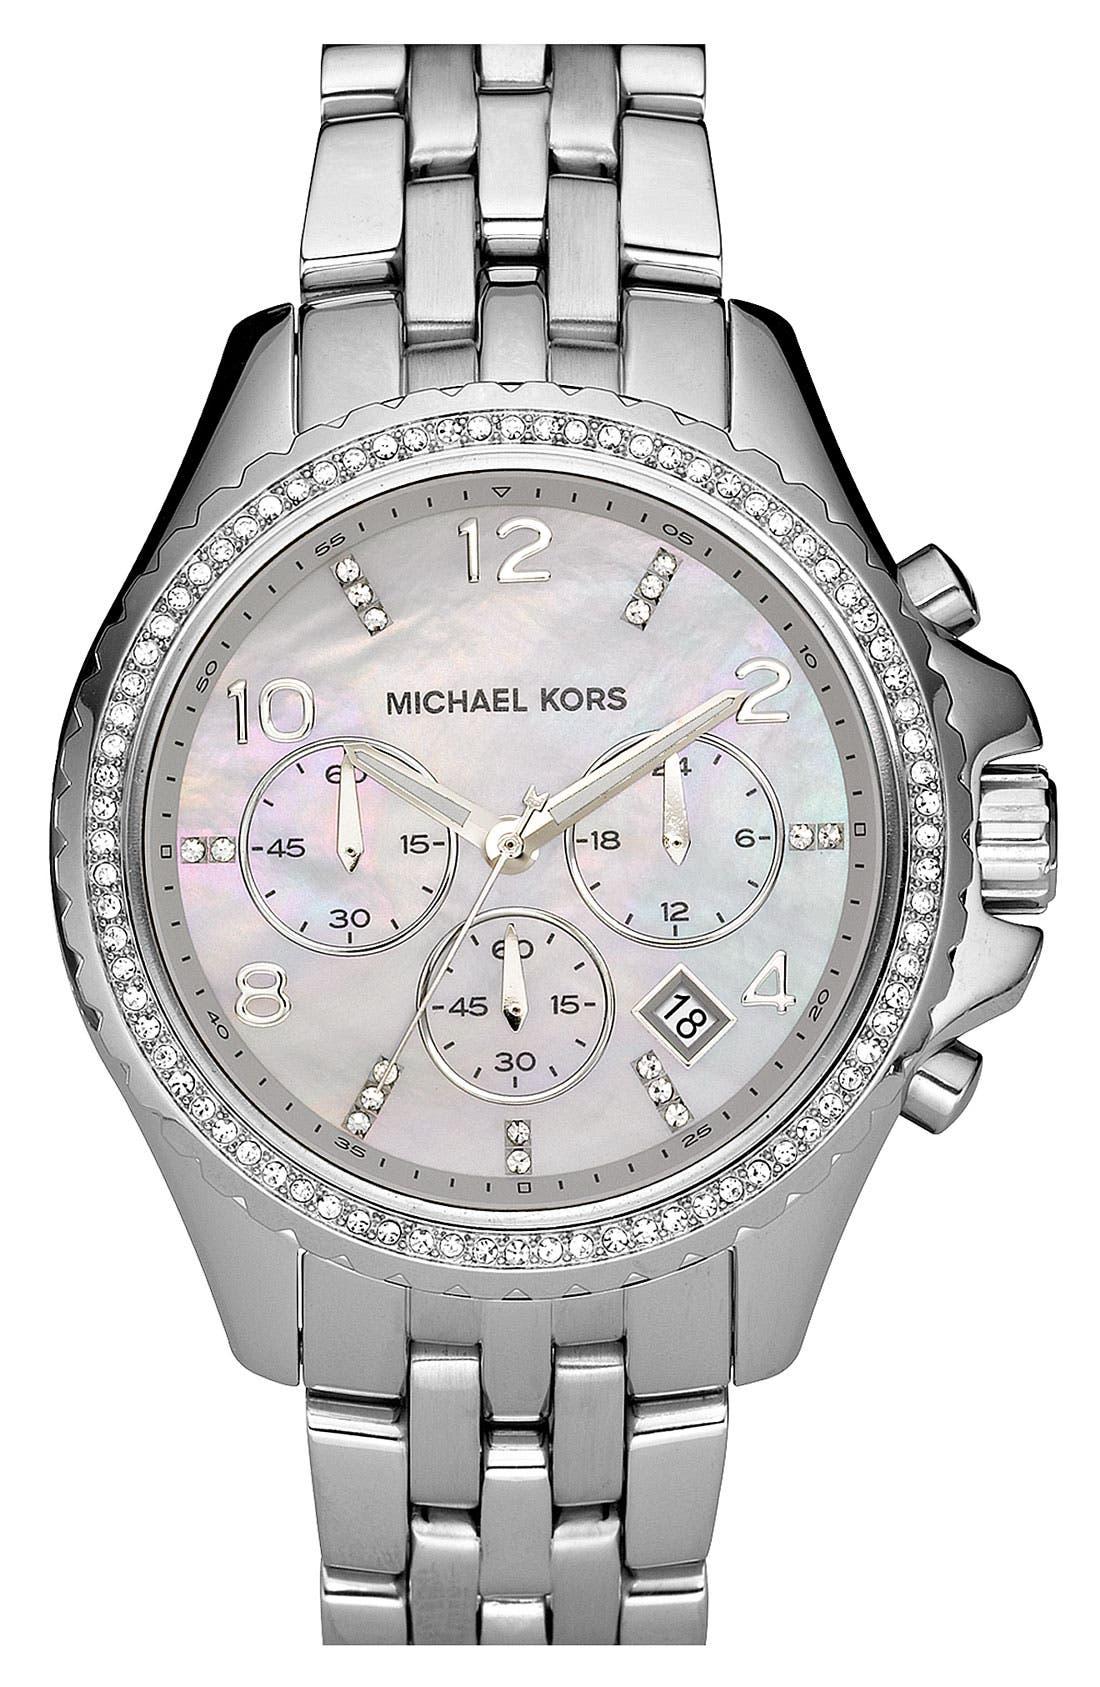 Main Image - Michael Kors 'Pilot' Watch